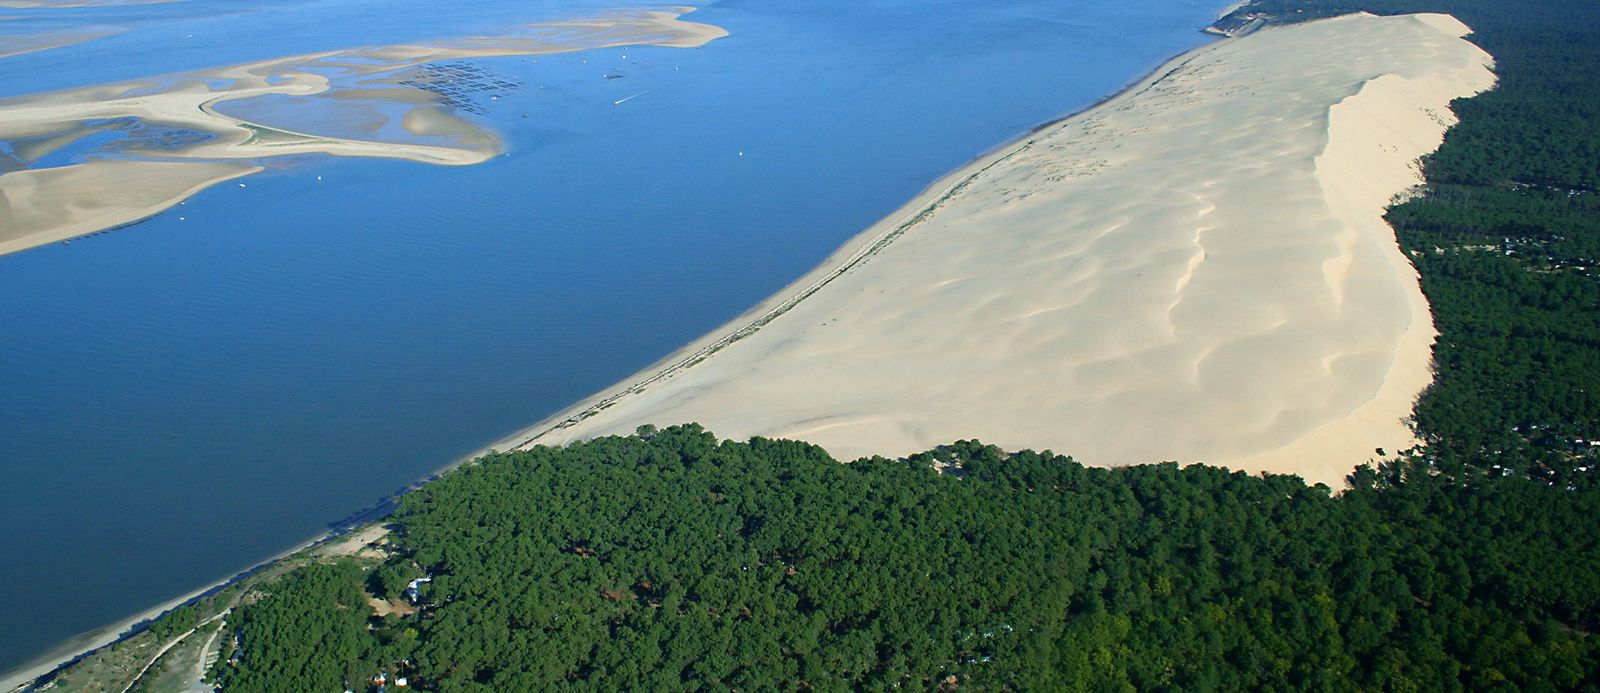 Escalader la dune du pilat l ge cap ferret - Restaurant dune du pyla ...